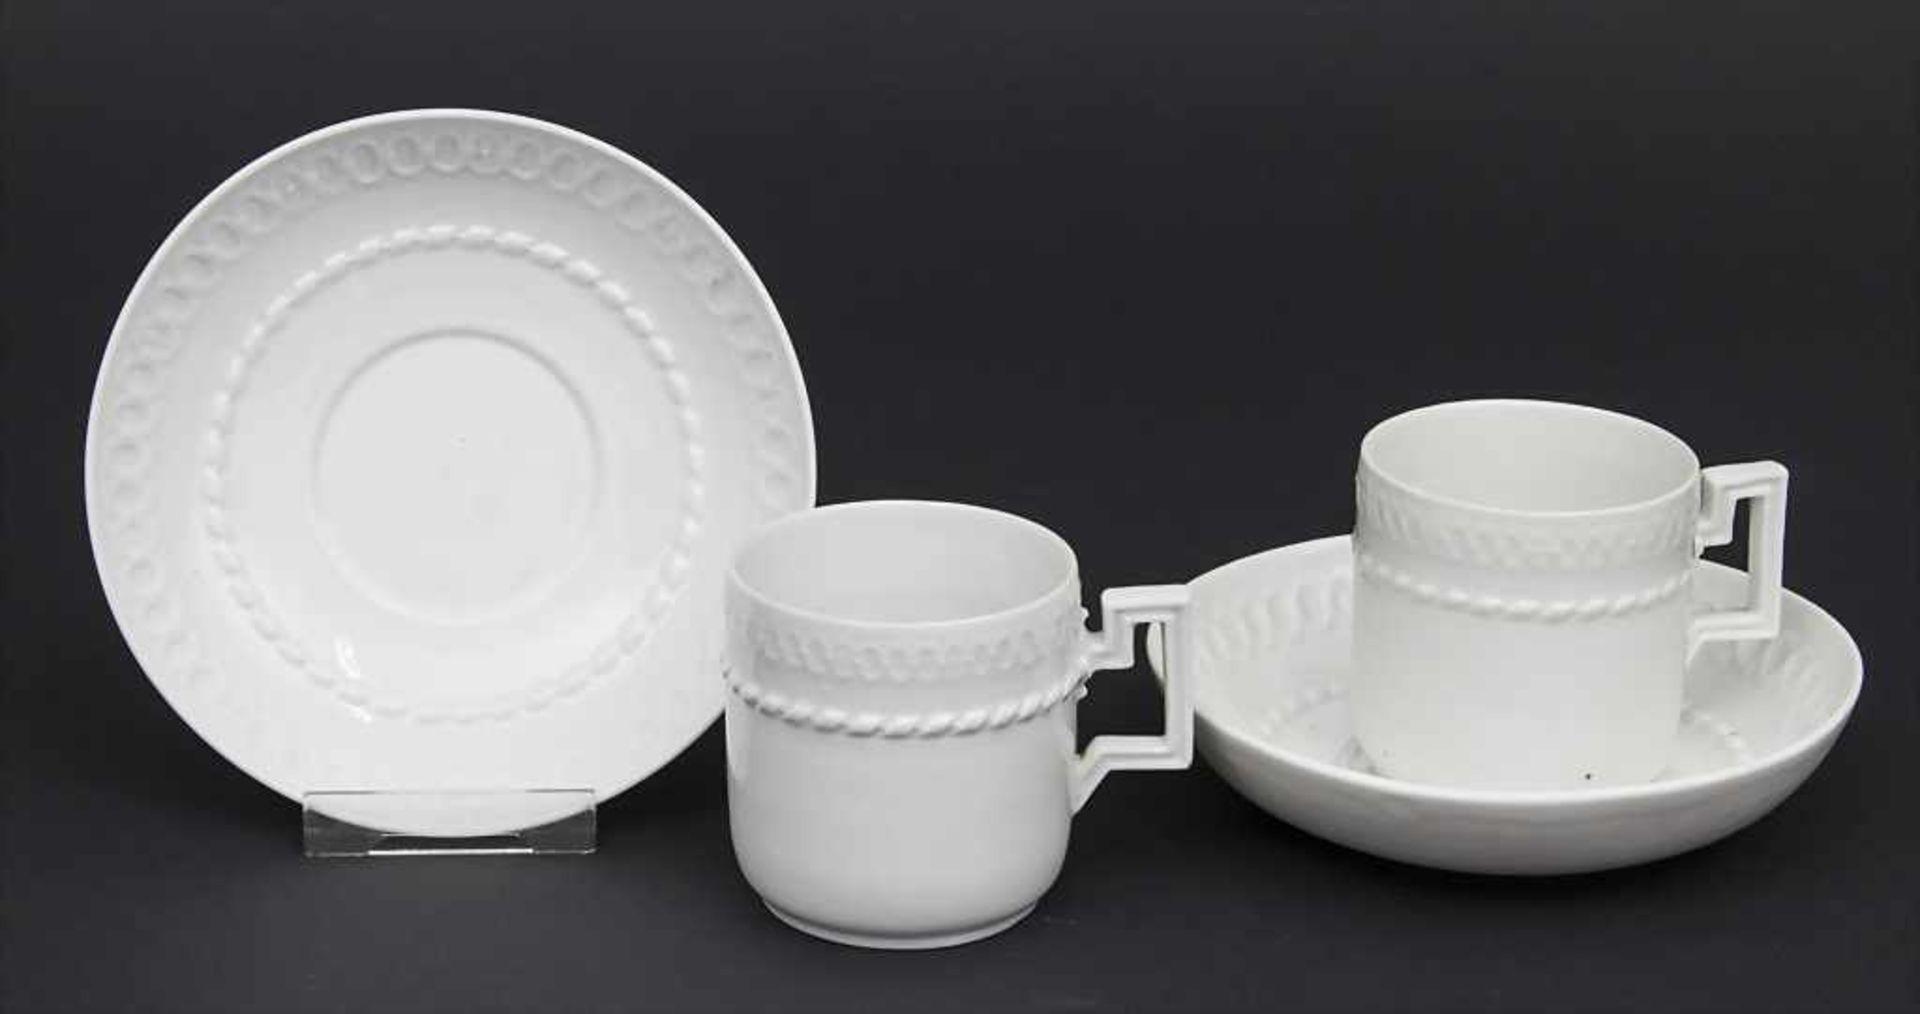 Paar Tassen mit UT / A pair of cups and saucers, Meissen, um 1820 Material: Porzellan, weiß,